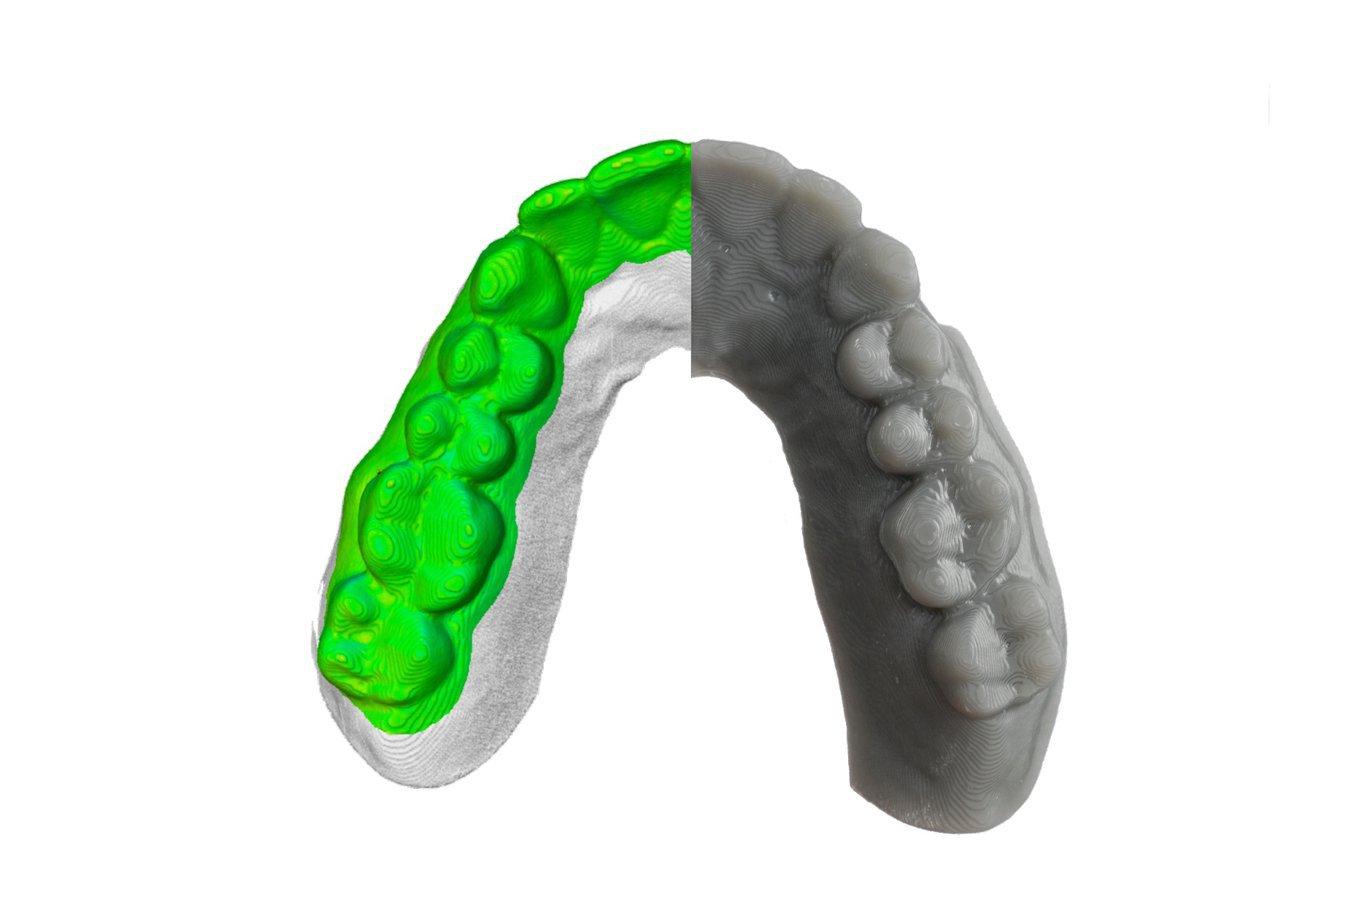 dental 3d printing resolution